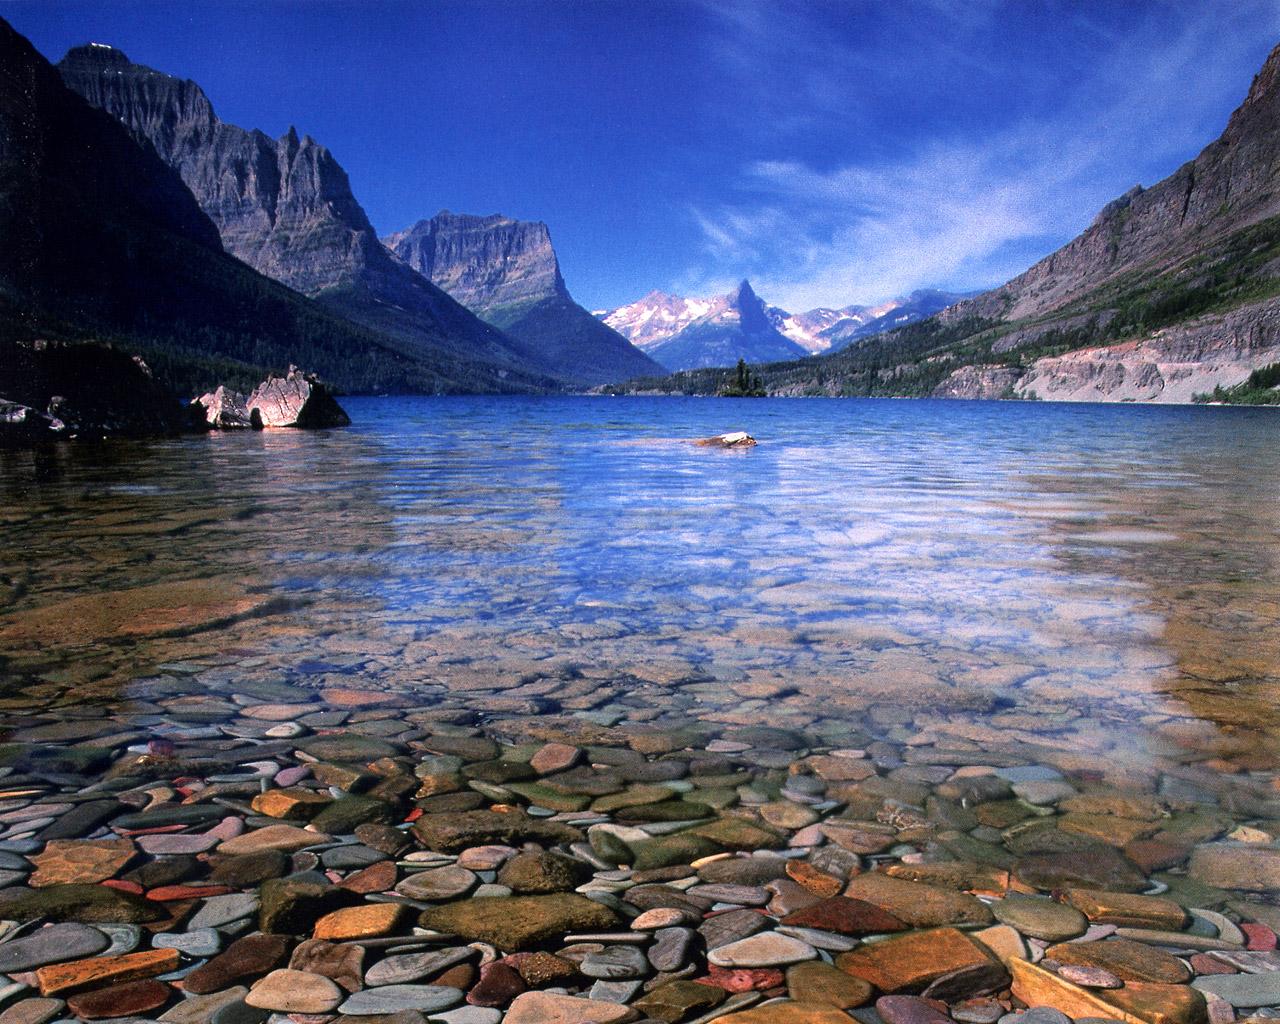 How to Enjoy Glacier National Park